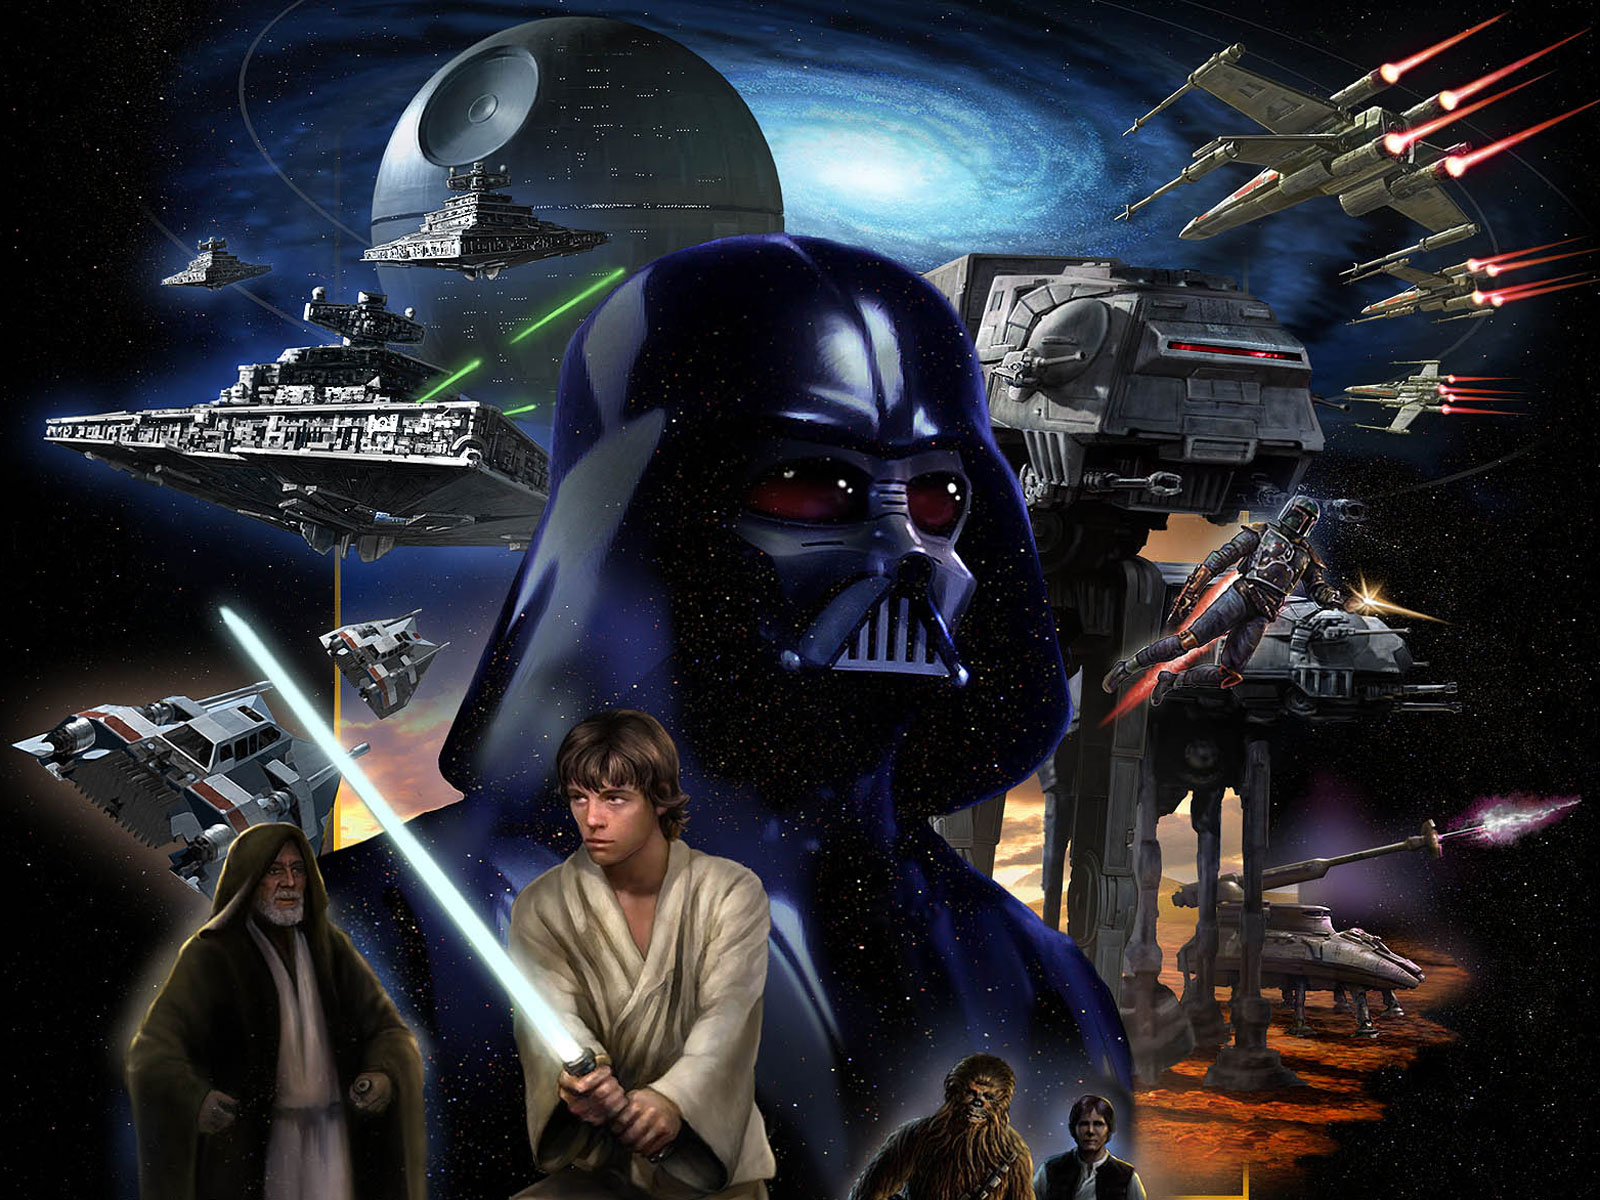 Star Wars Wallpapers Hd Wallpaper Widescreen 3 1600x1200